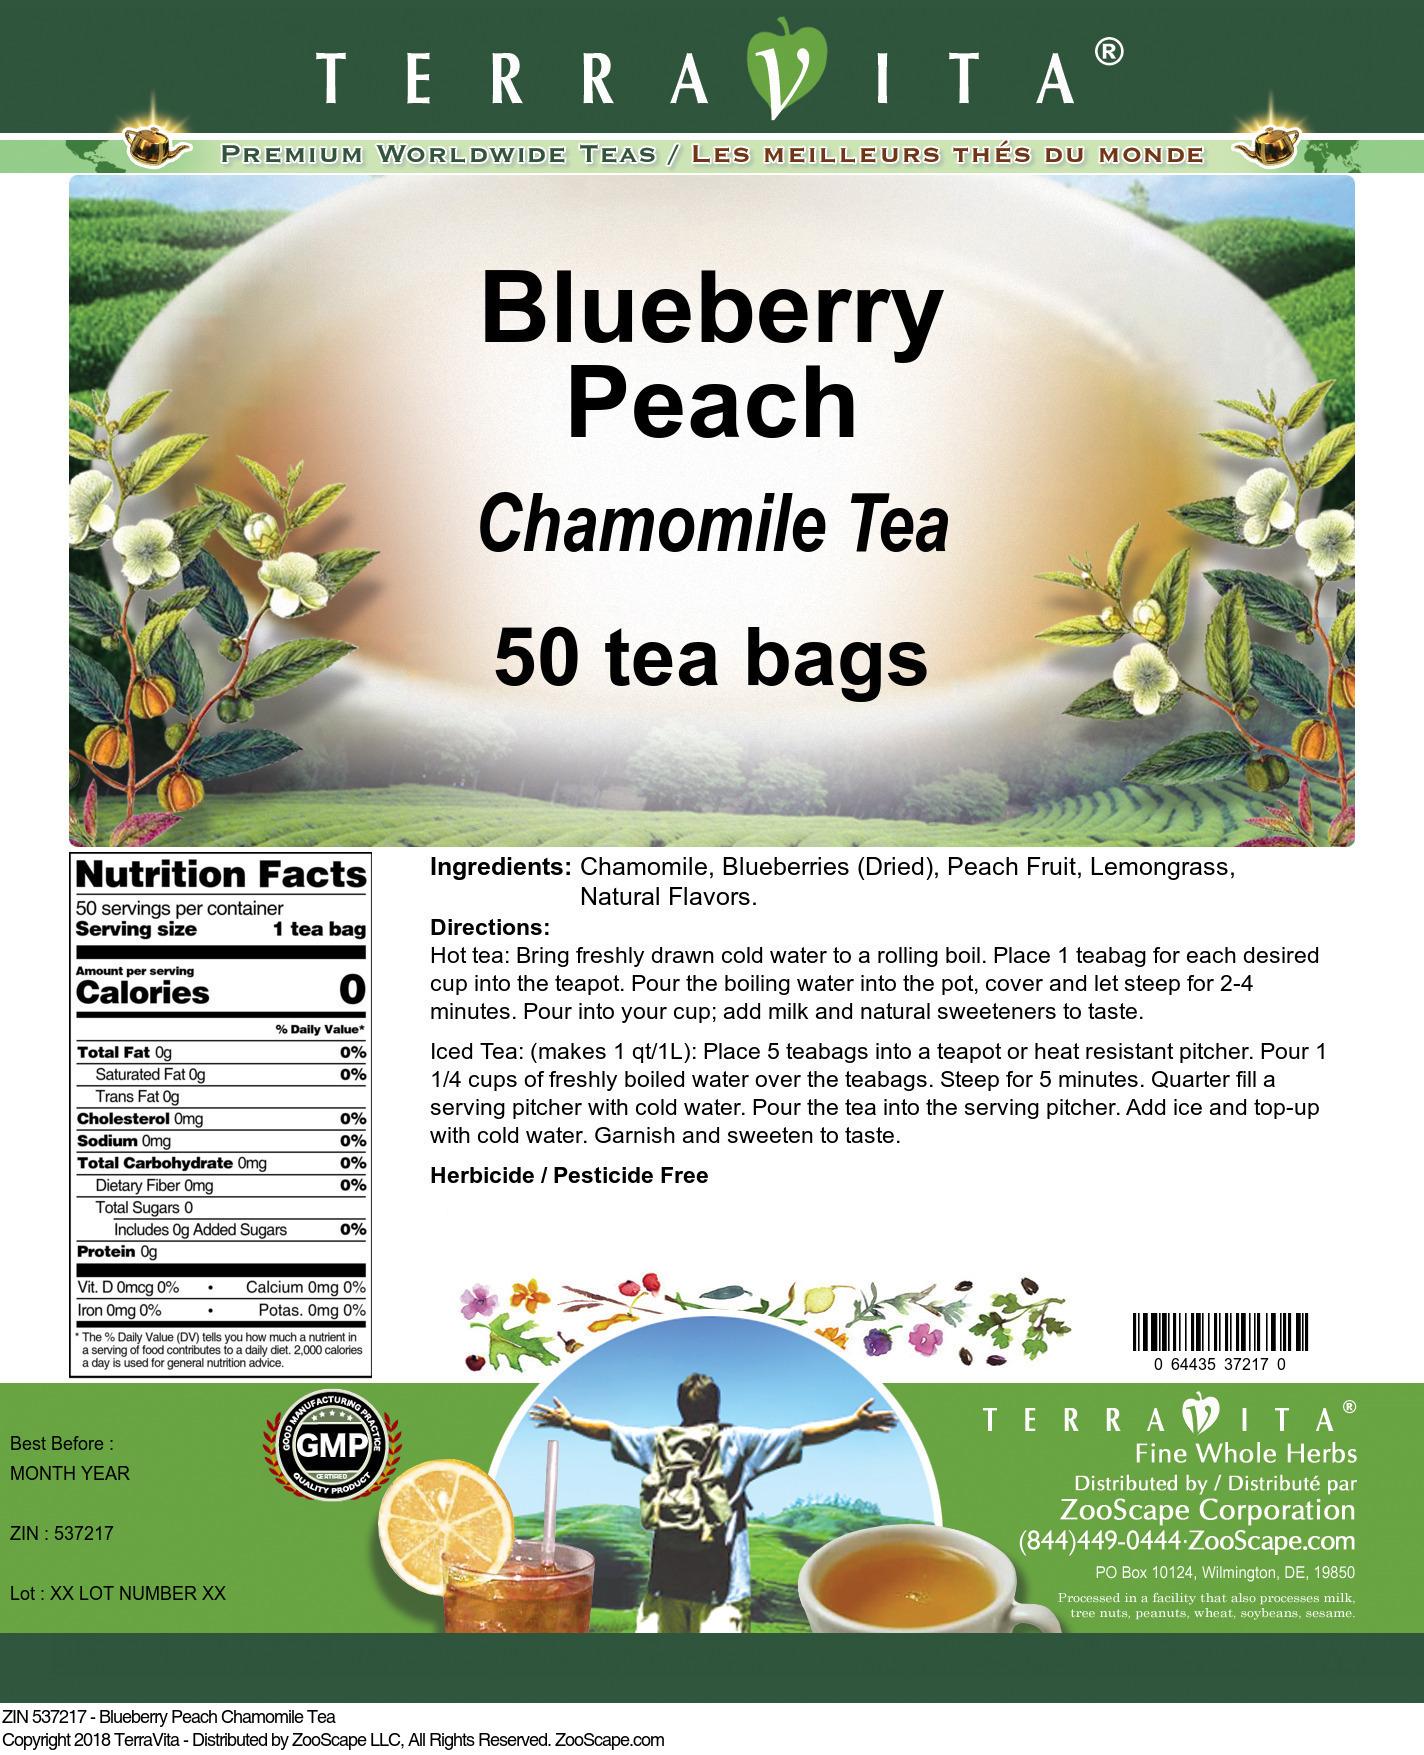 Blueberry Peach Chamomile Tea